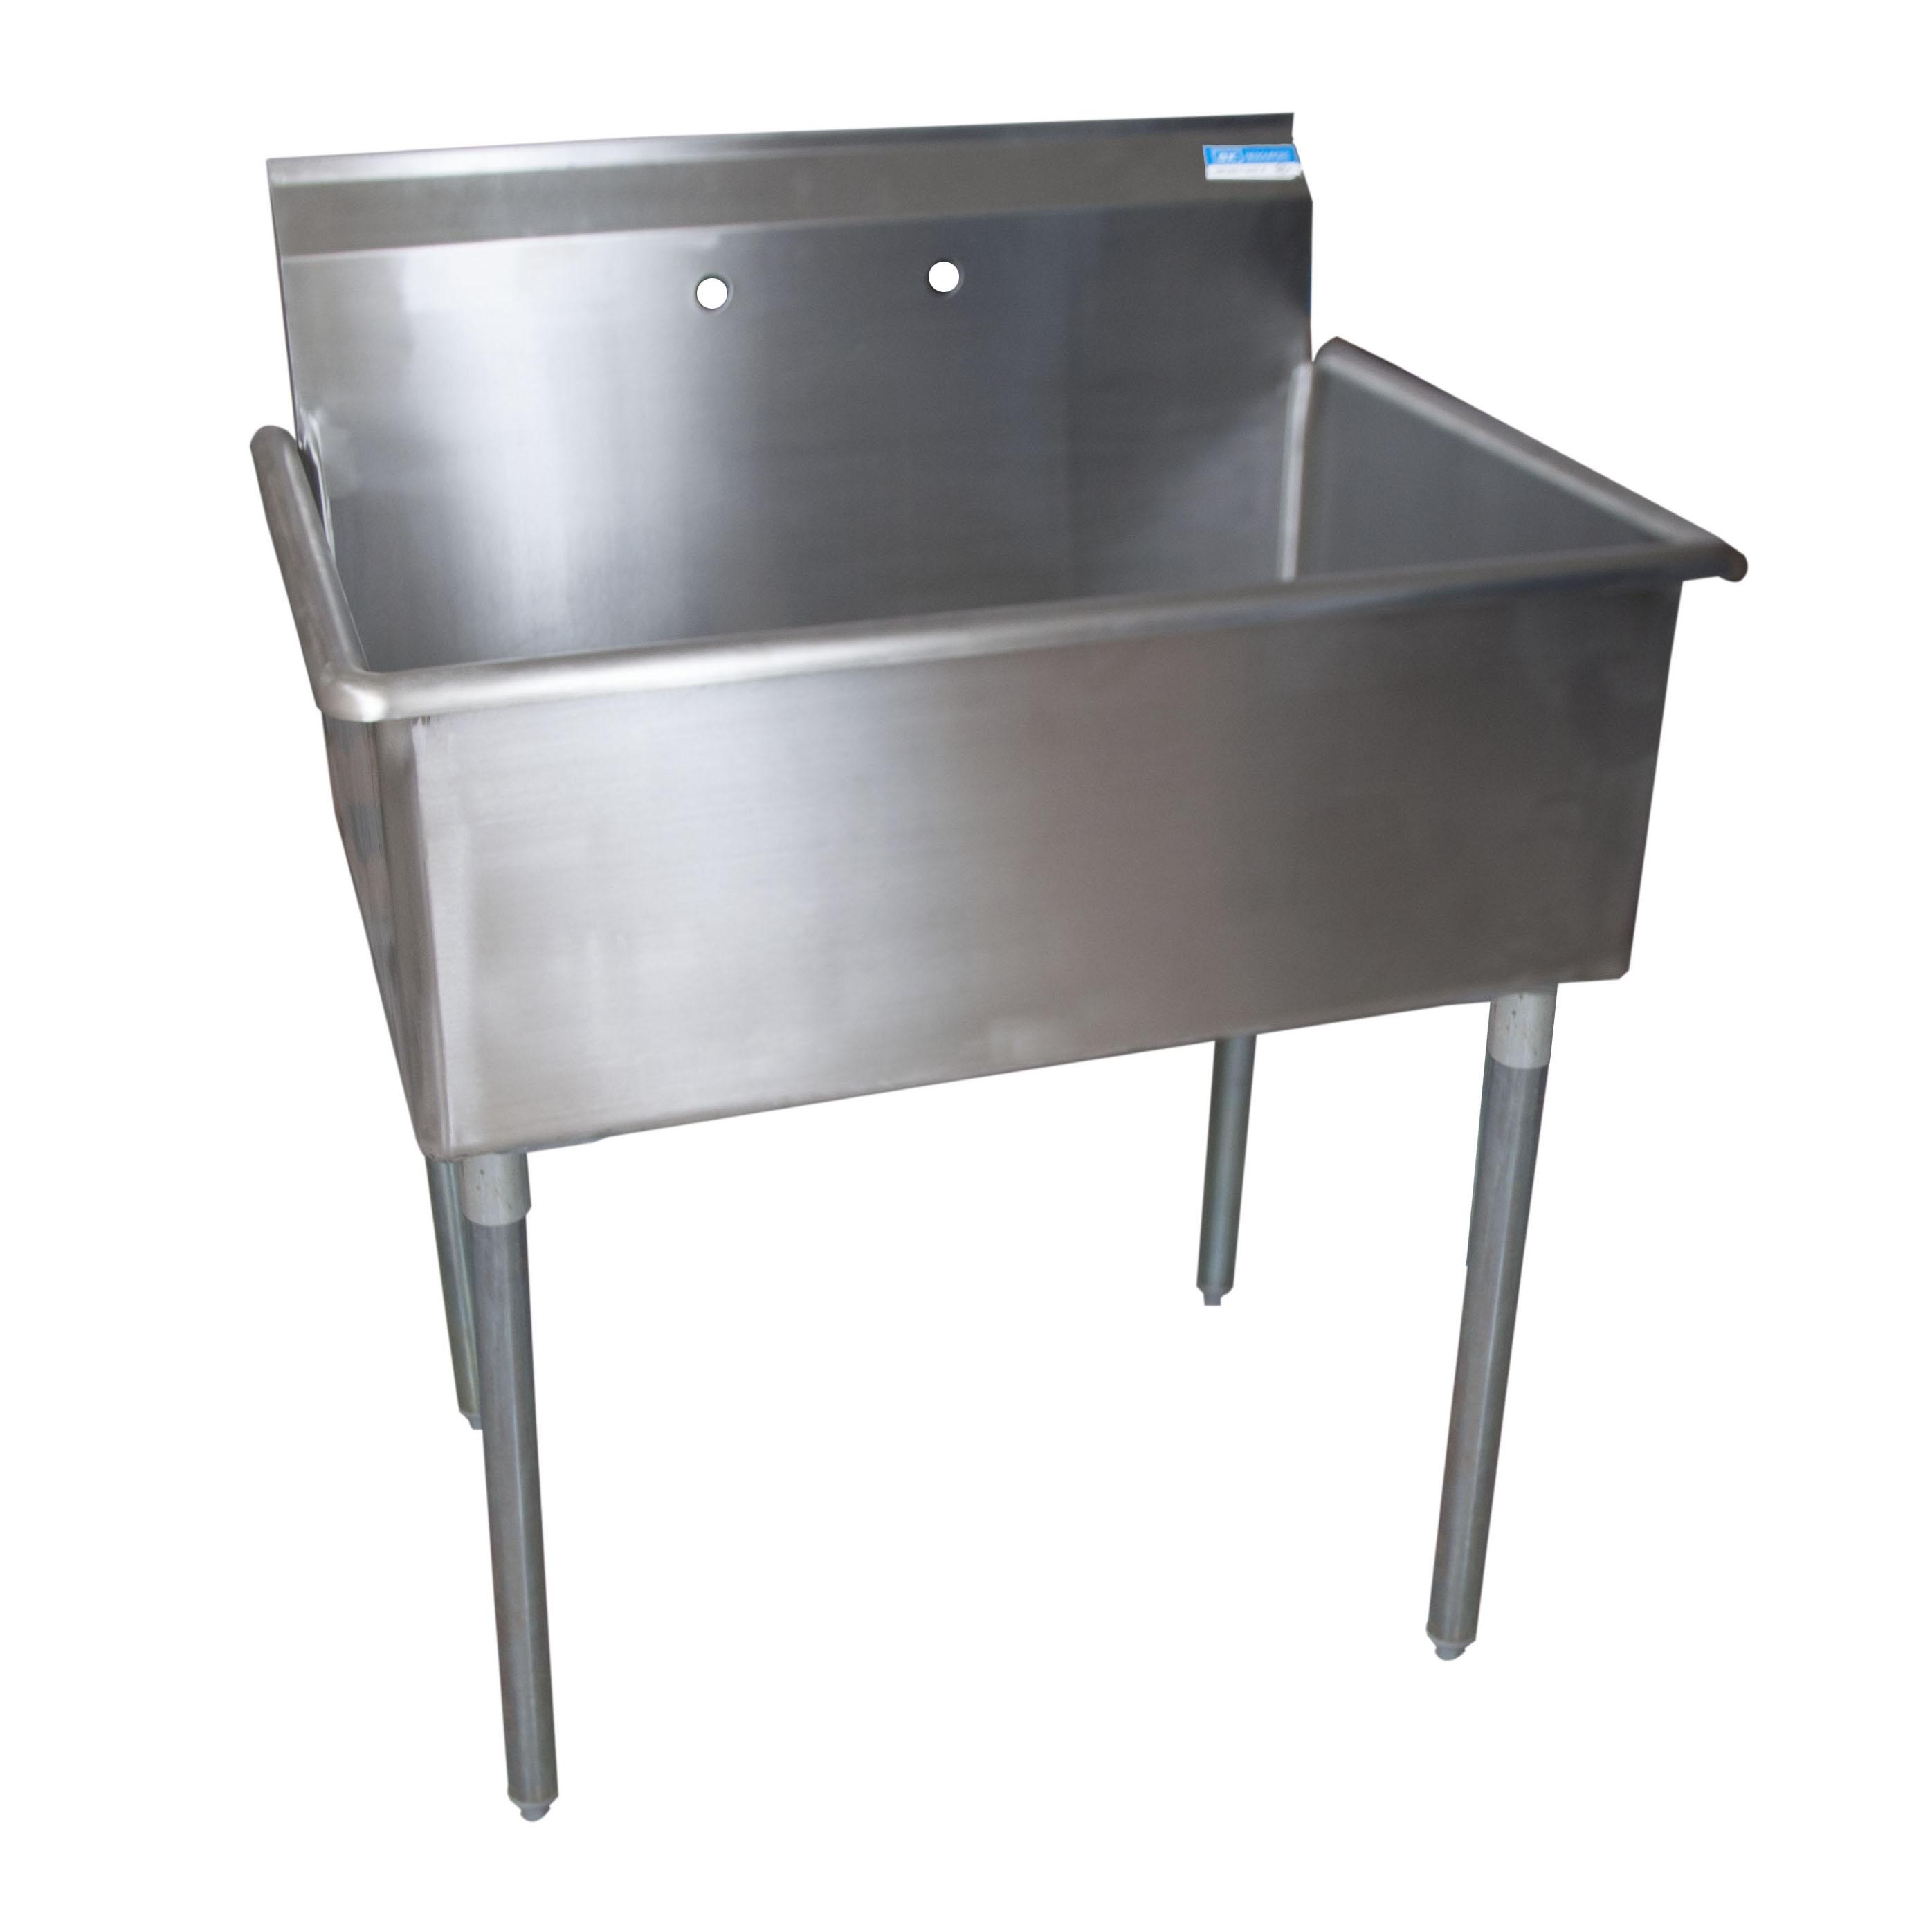 BK Resources BKUS6-1-3624-14 sink, (1) one compartment